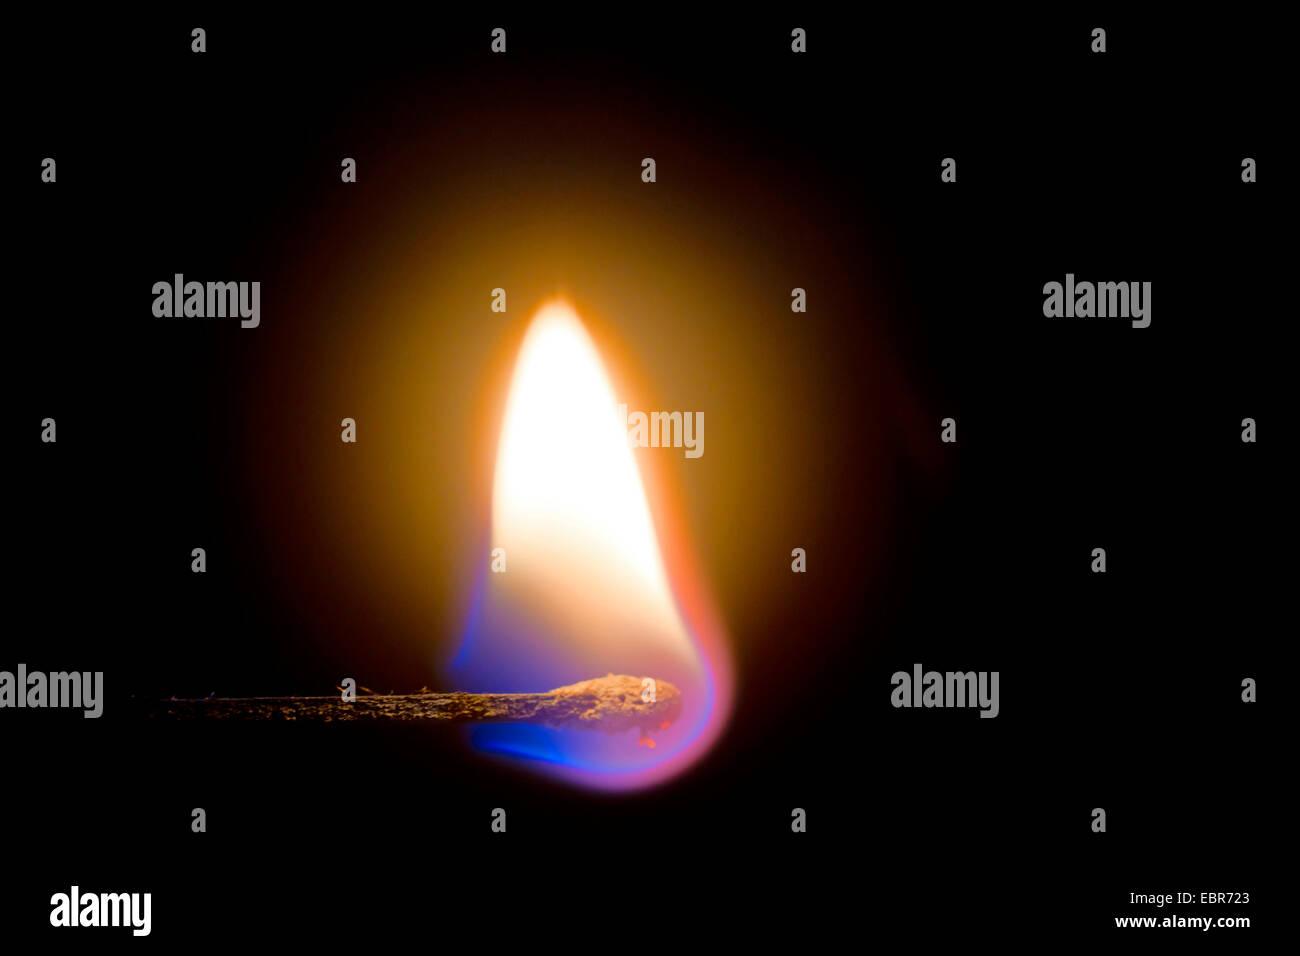 burning matchstick, Germany - Stock Image